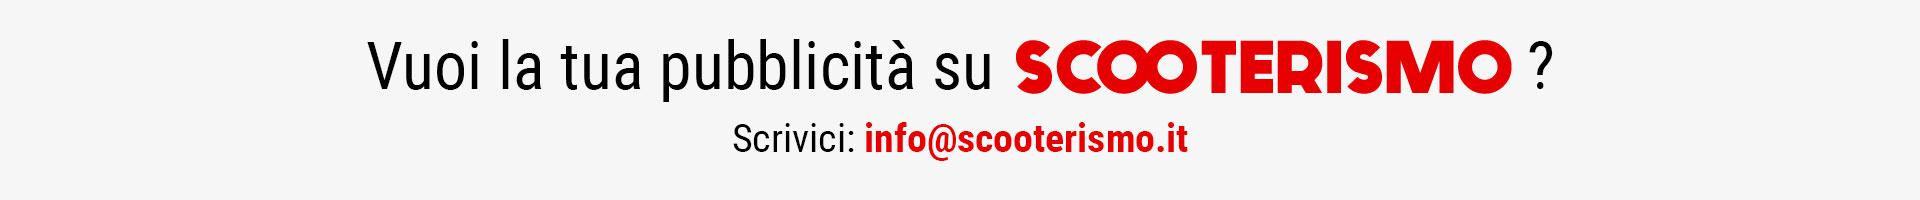 pubblicita scooterismo